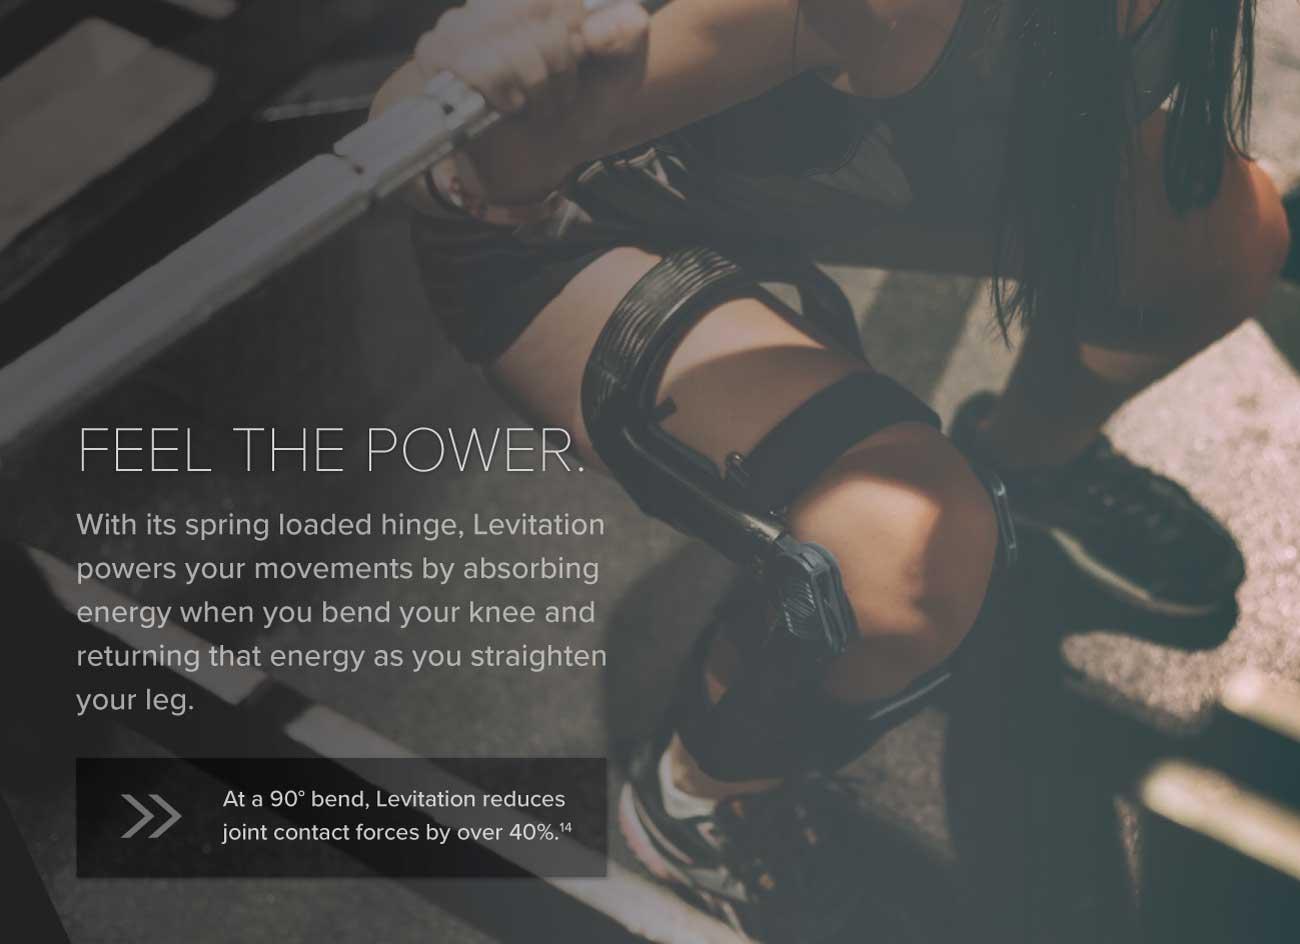 knee extension assist hinge powers the knee